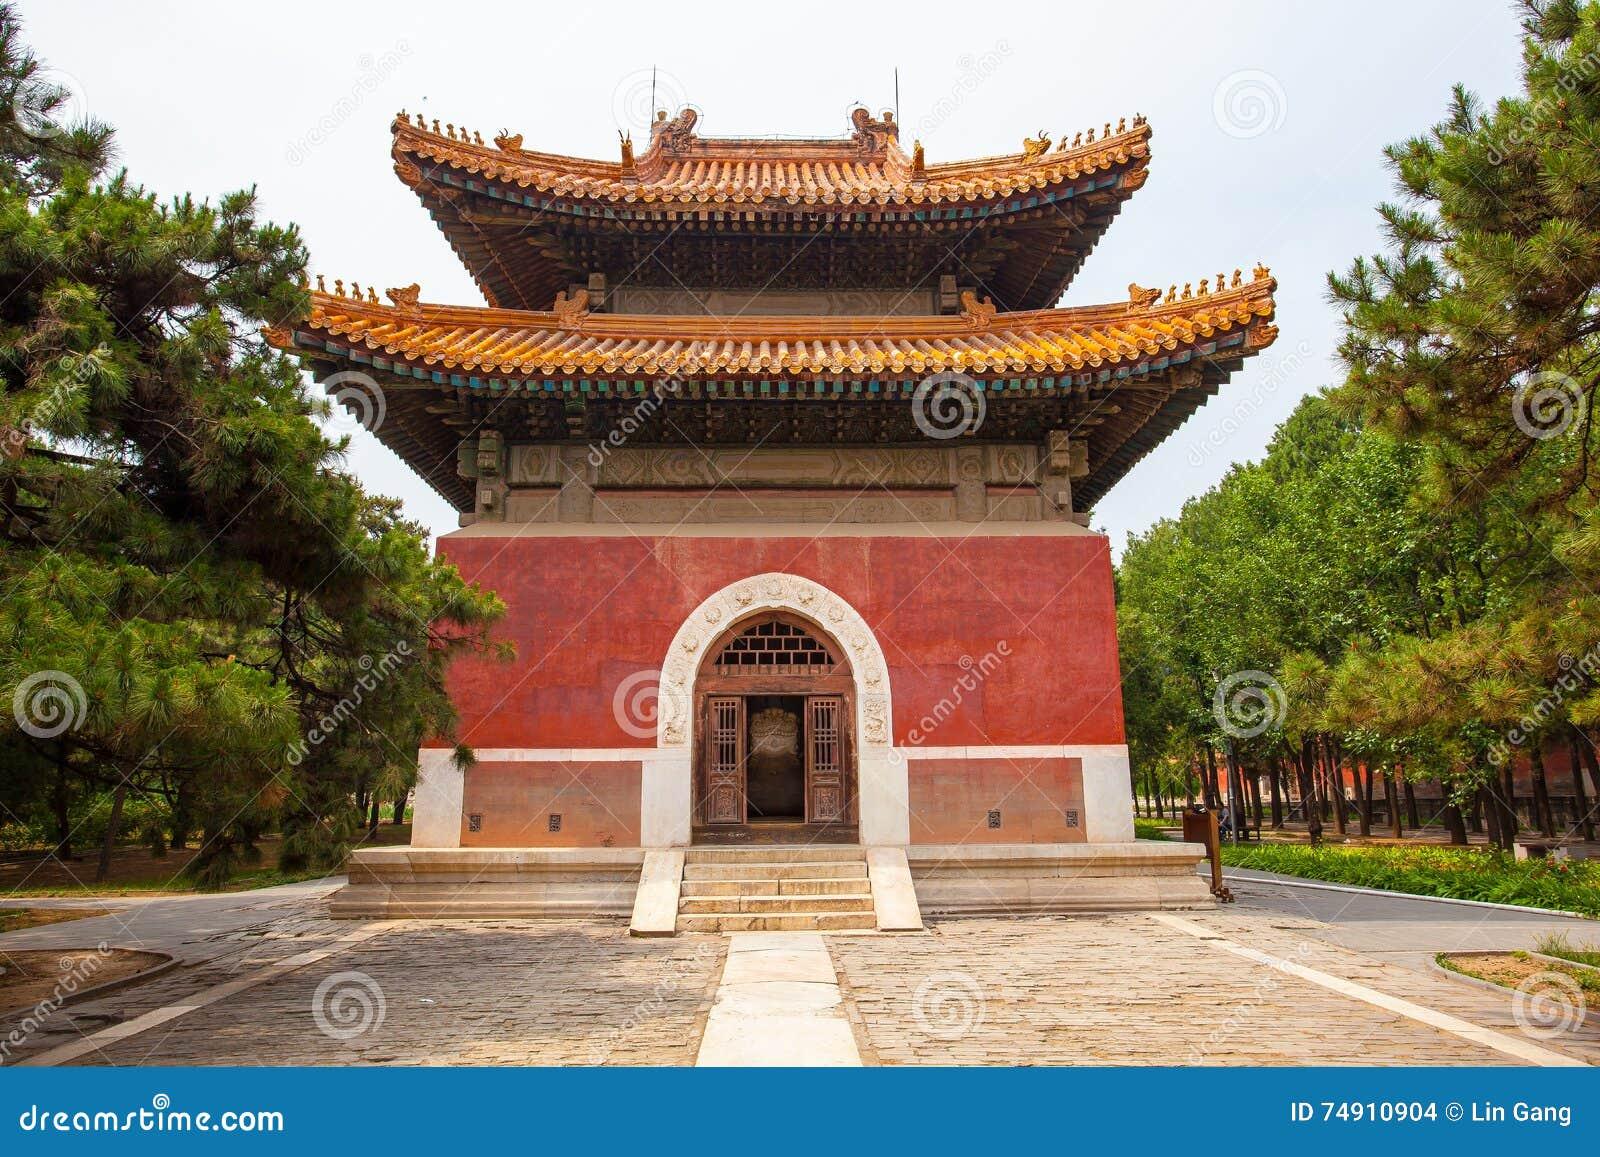 Eastern Qing Mausoleums- Cixi Mausoleum scenery